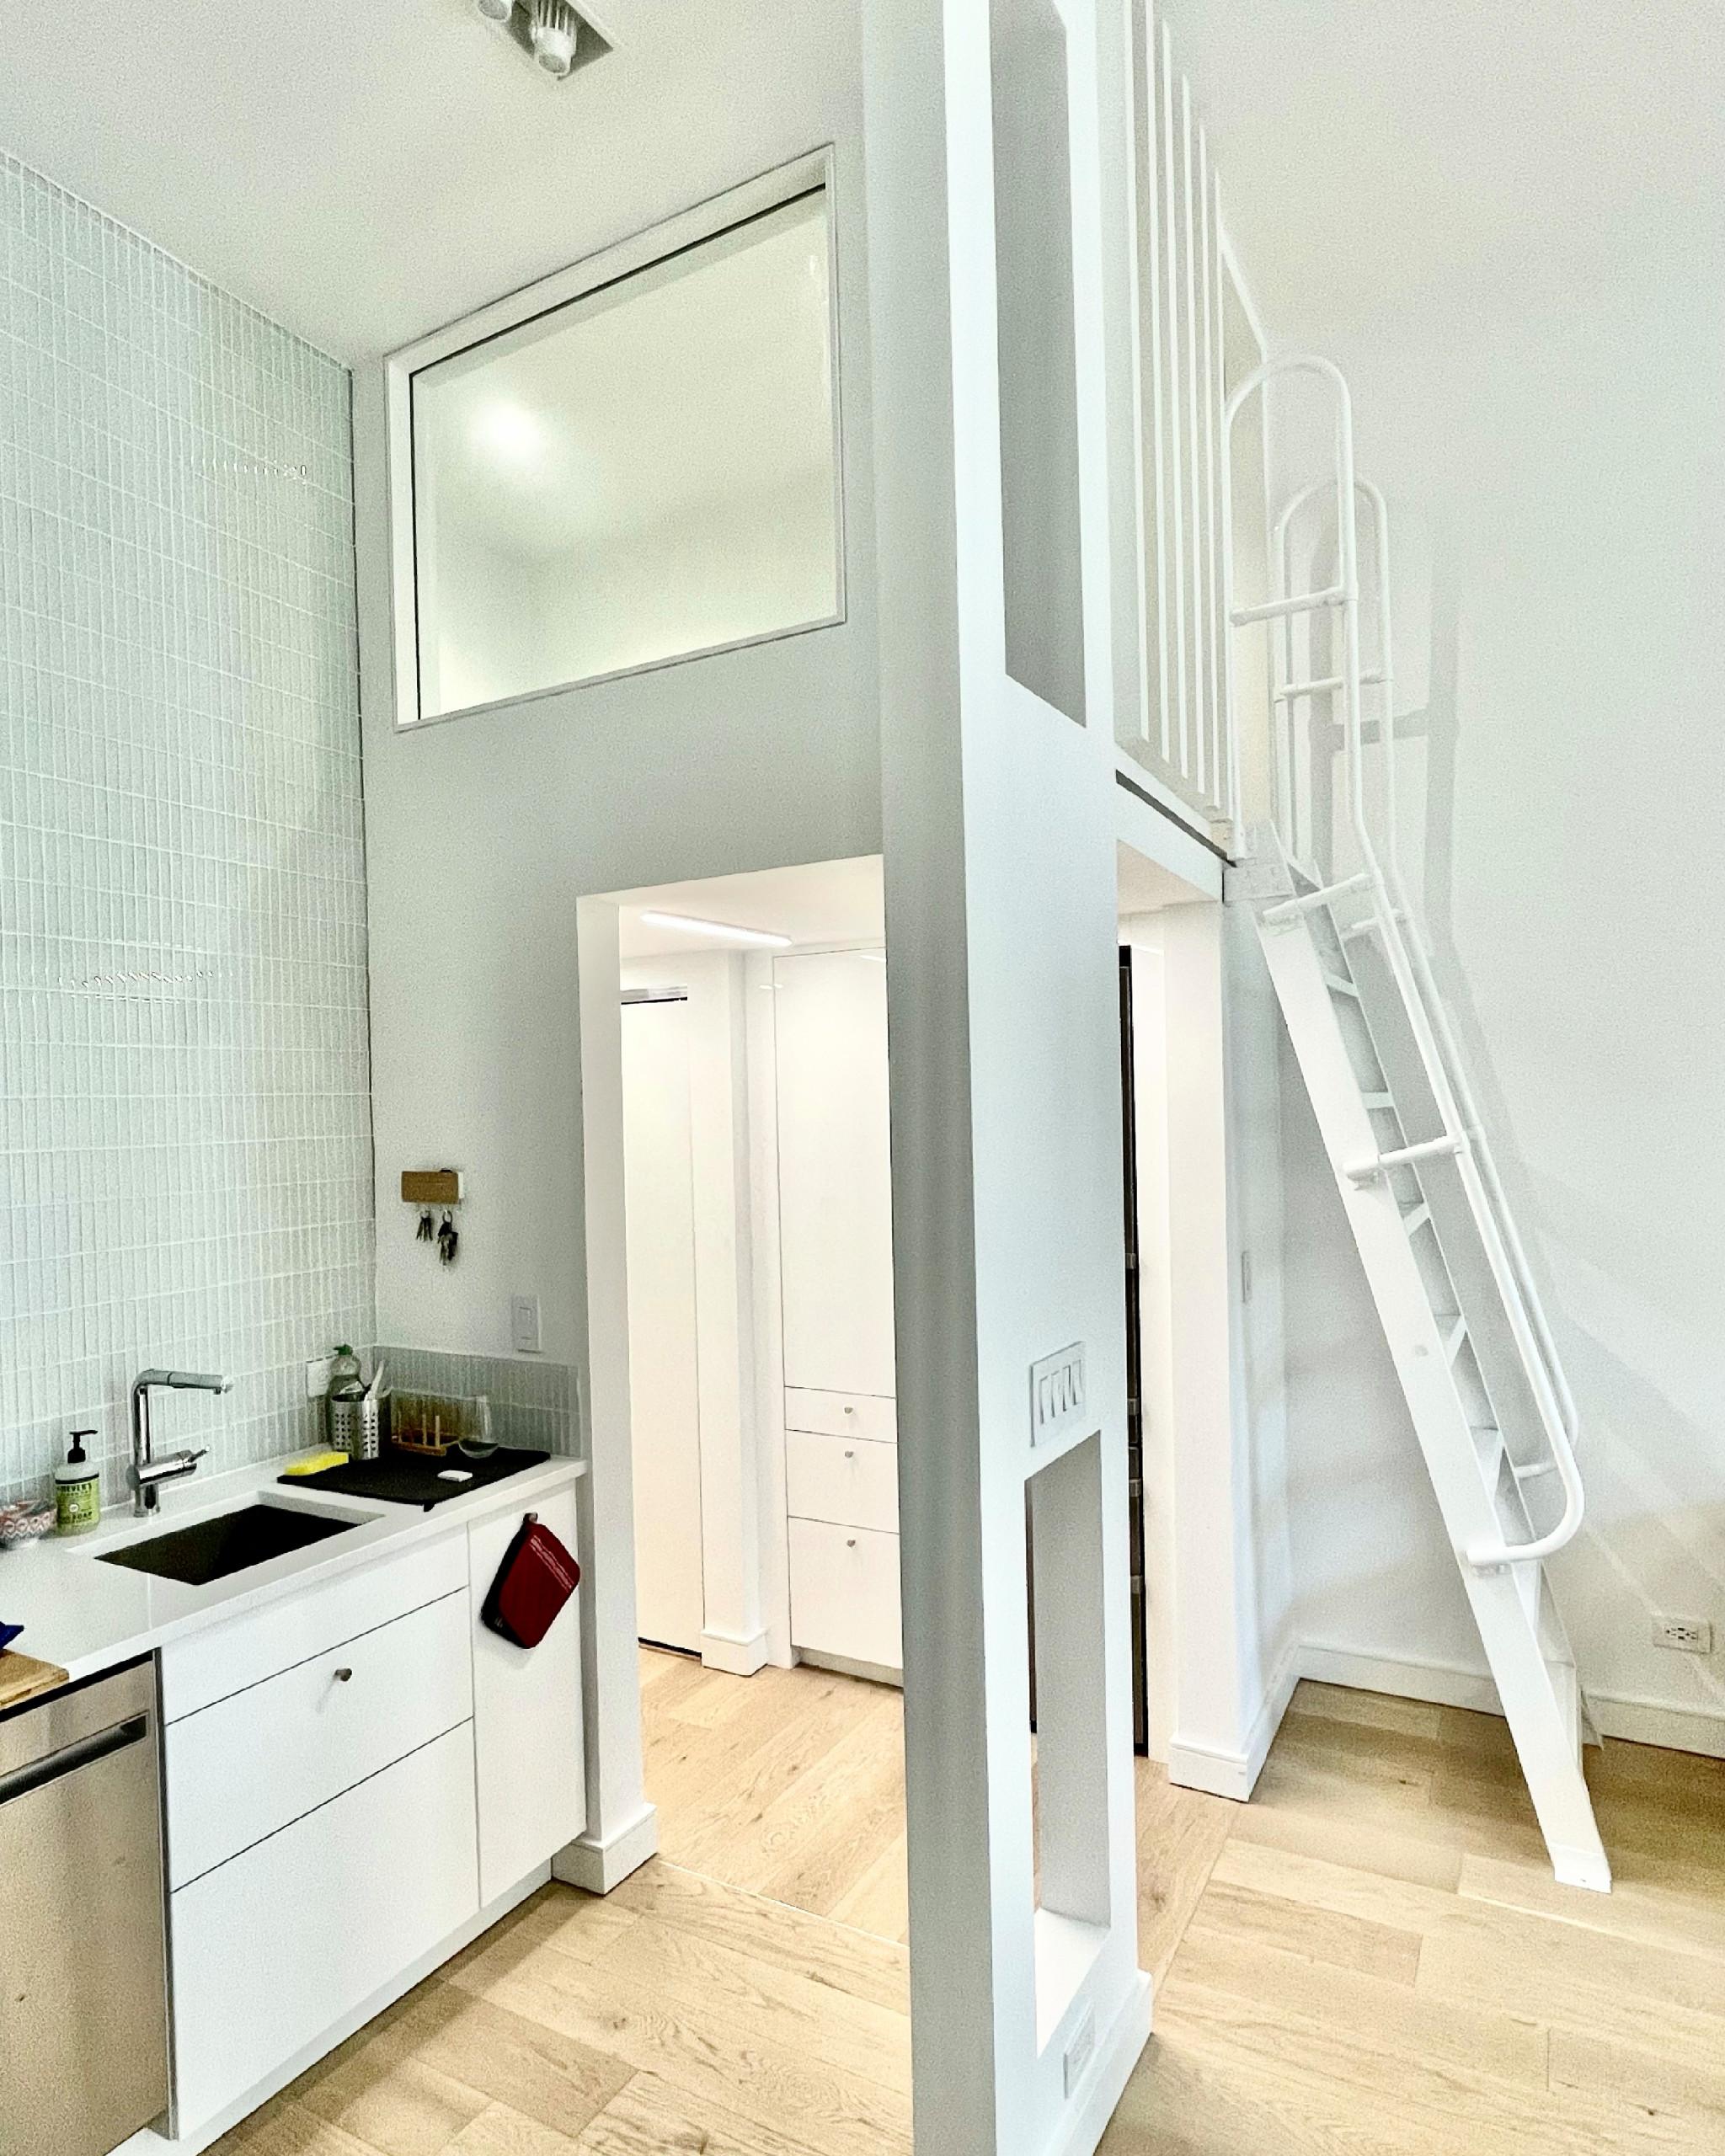 The Borrow Light Apartment NYC